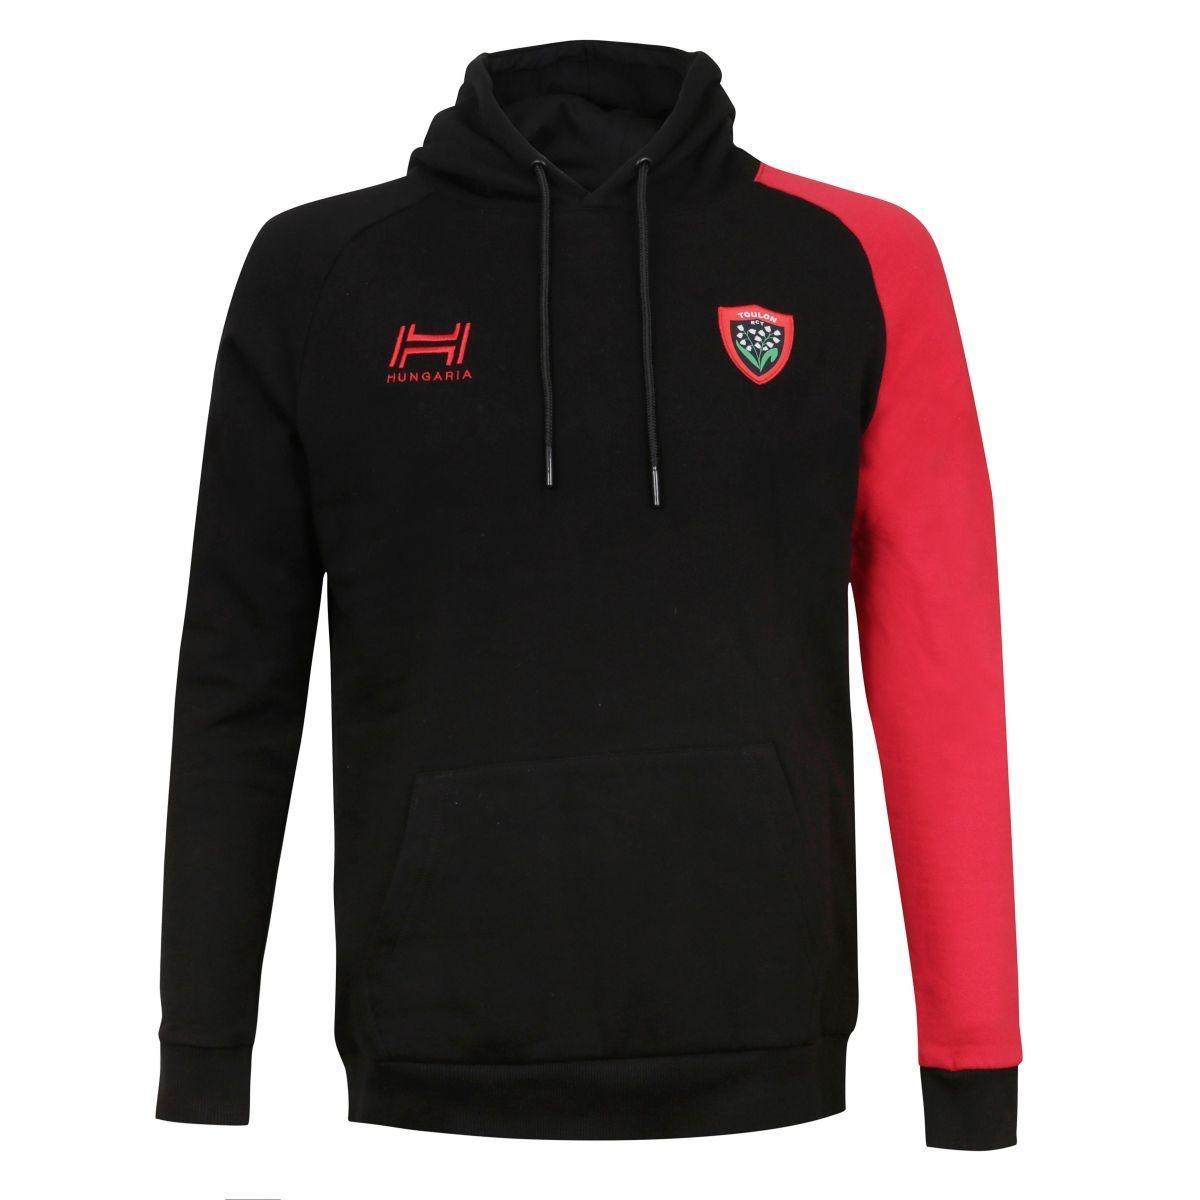 Sweat Match Rugby Club Toulonnais